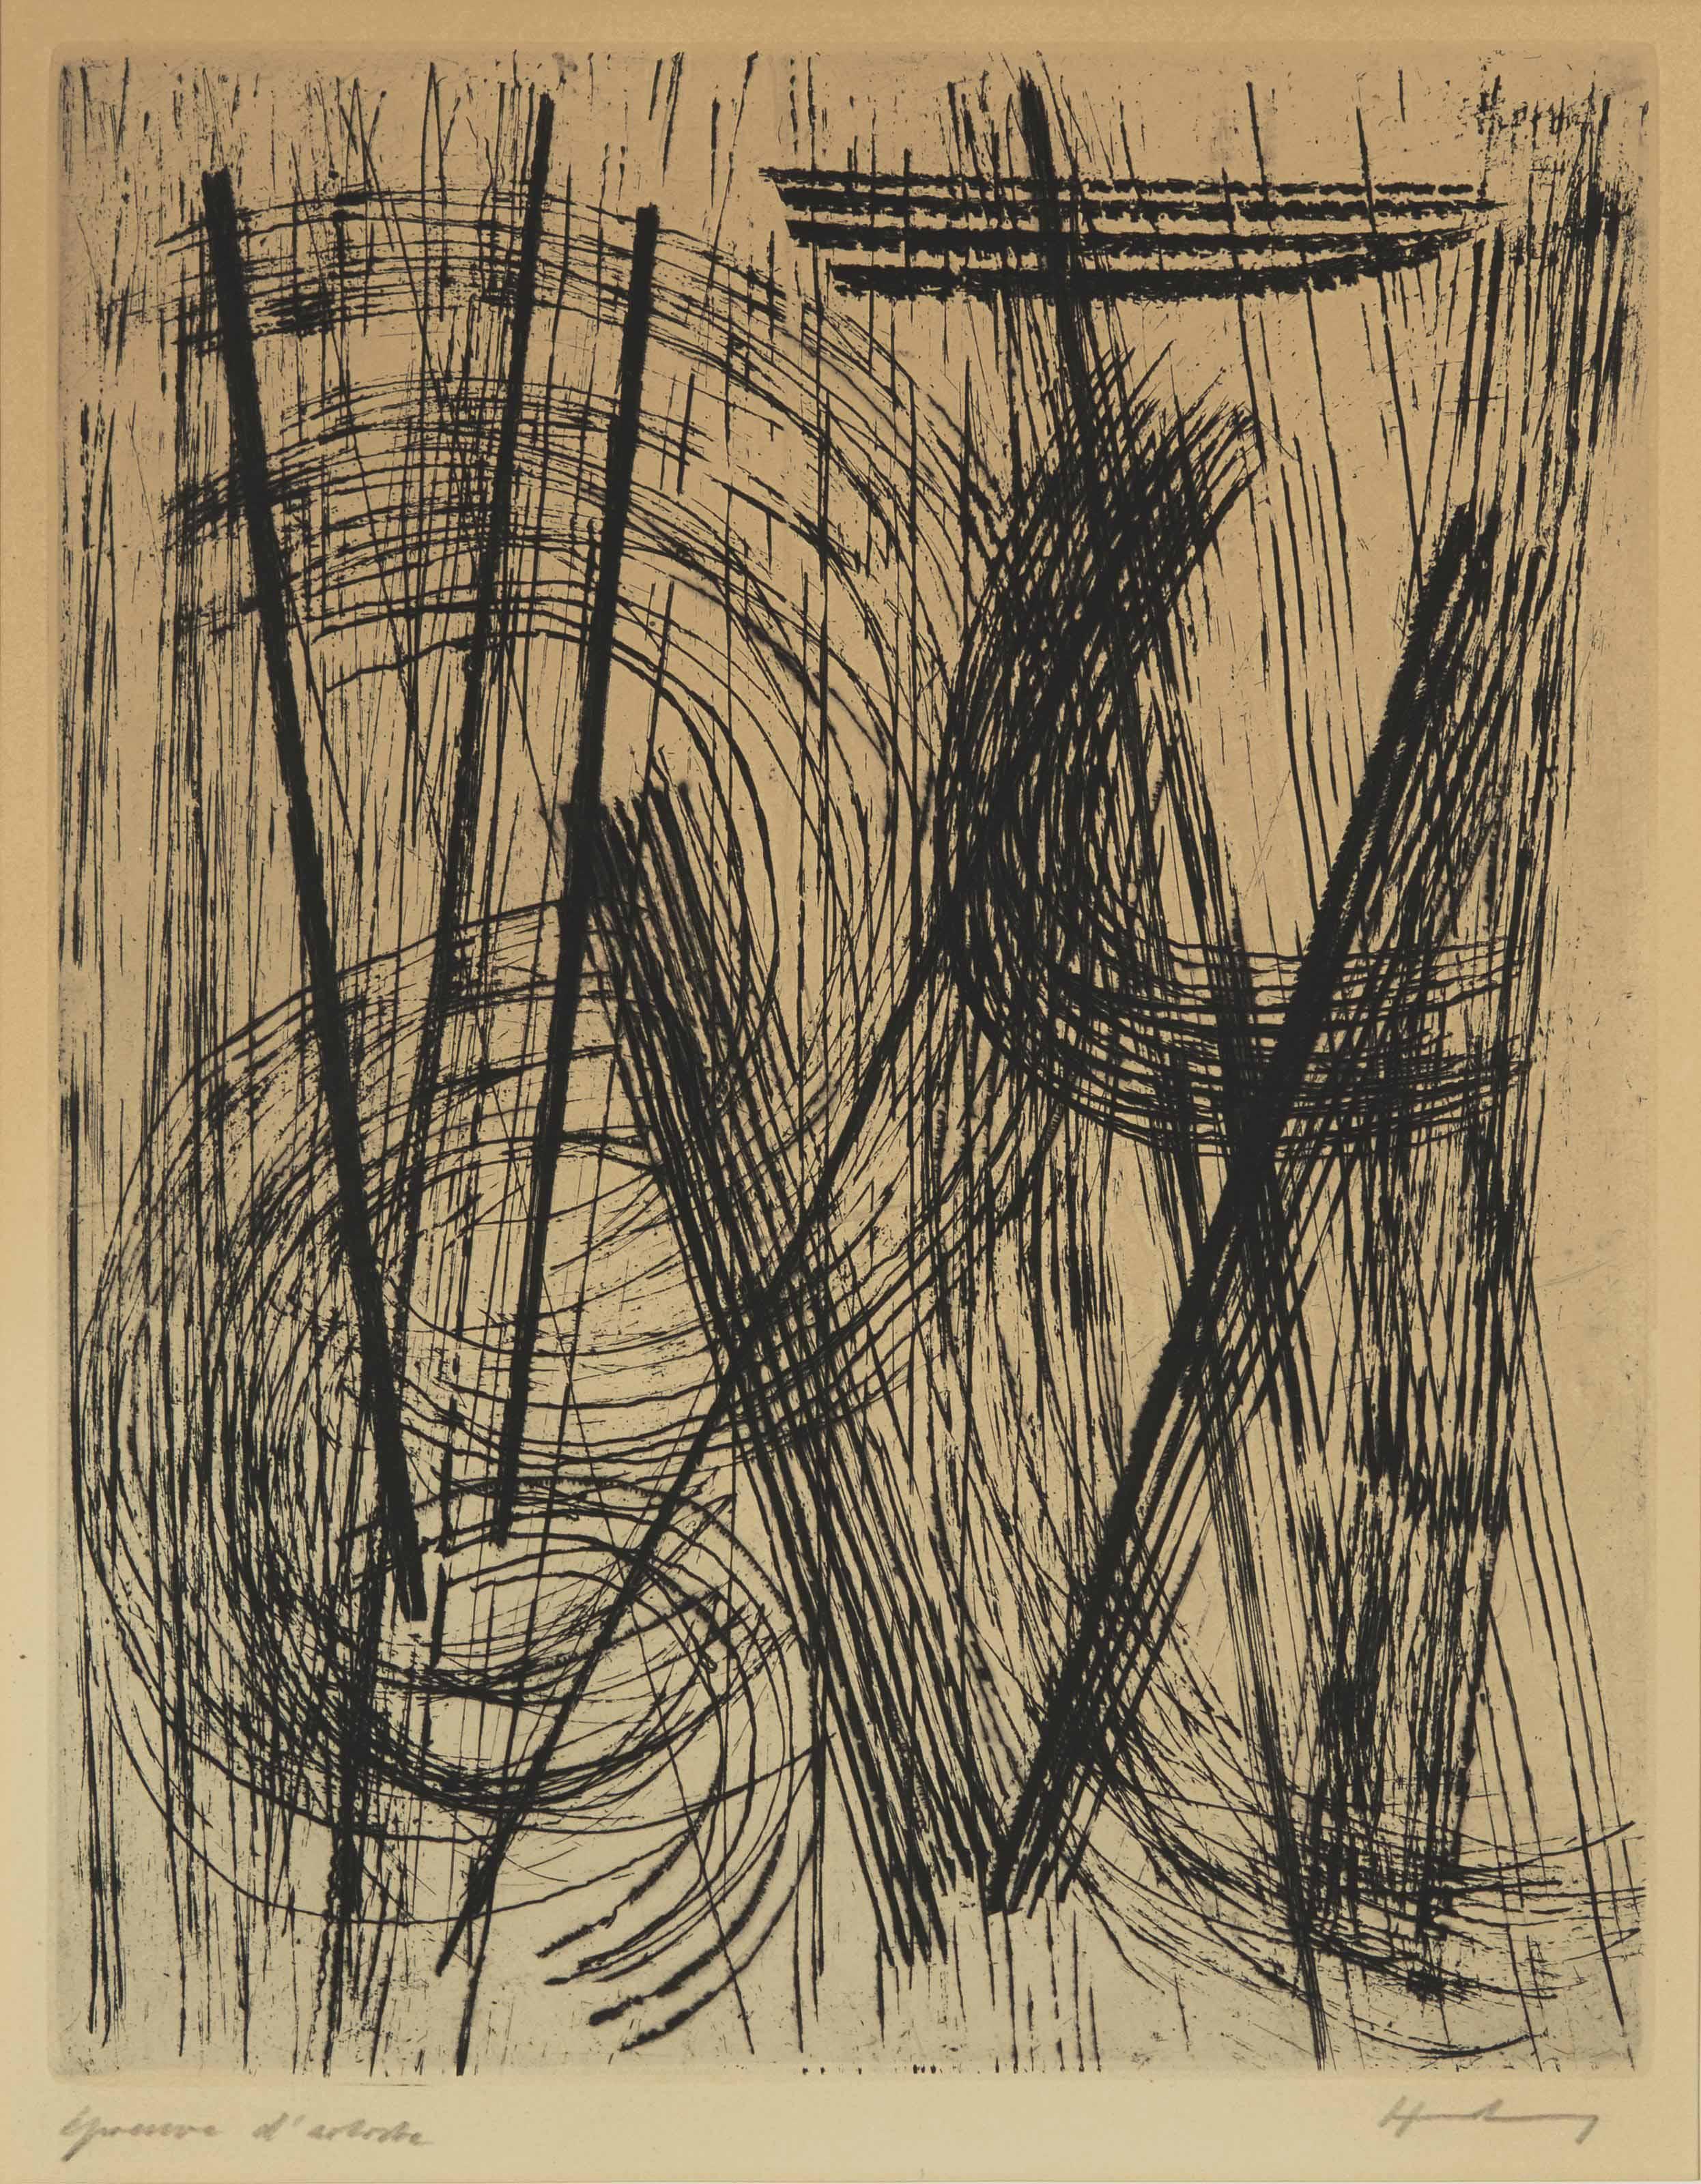 HANS HARTUNG (LEIPZIG 1904-ANT